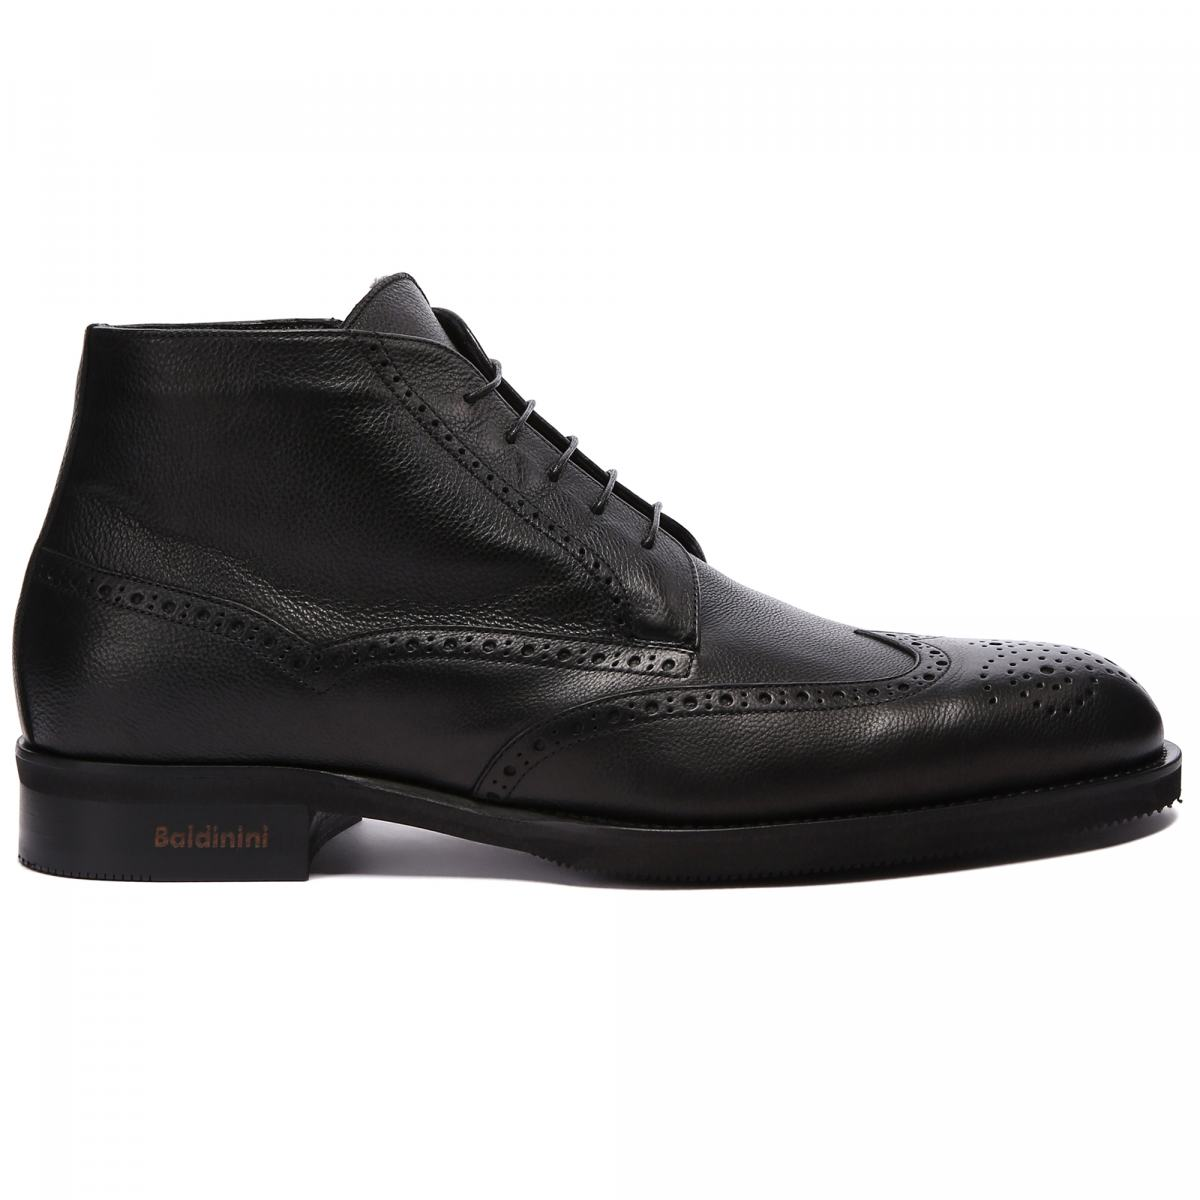 Ботинки Baldinini черного цвета